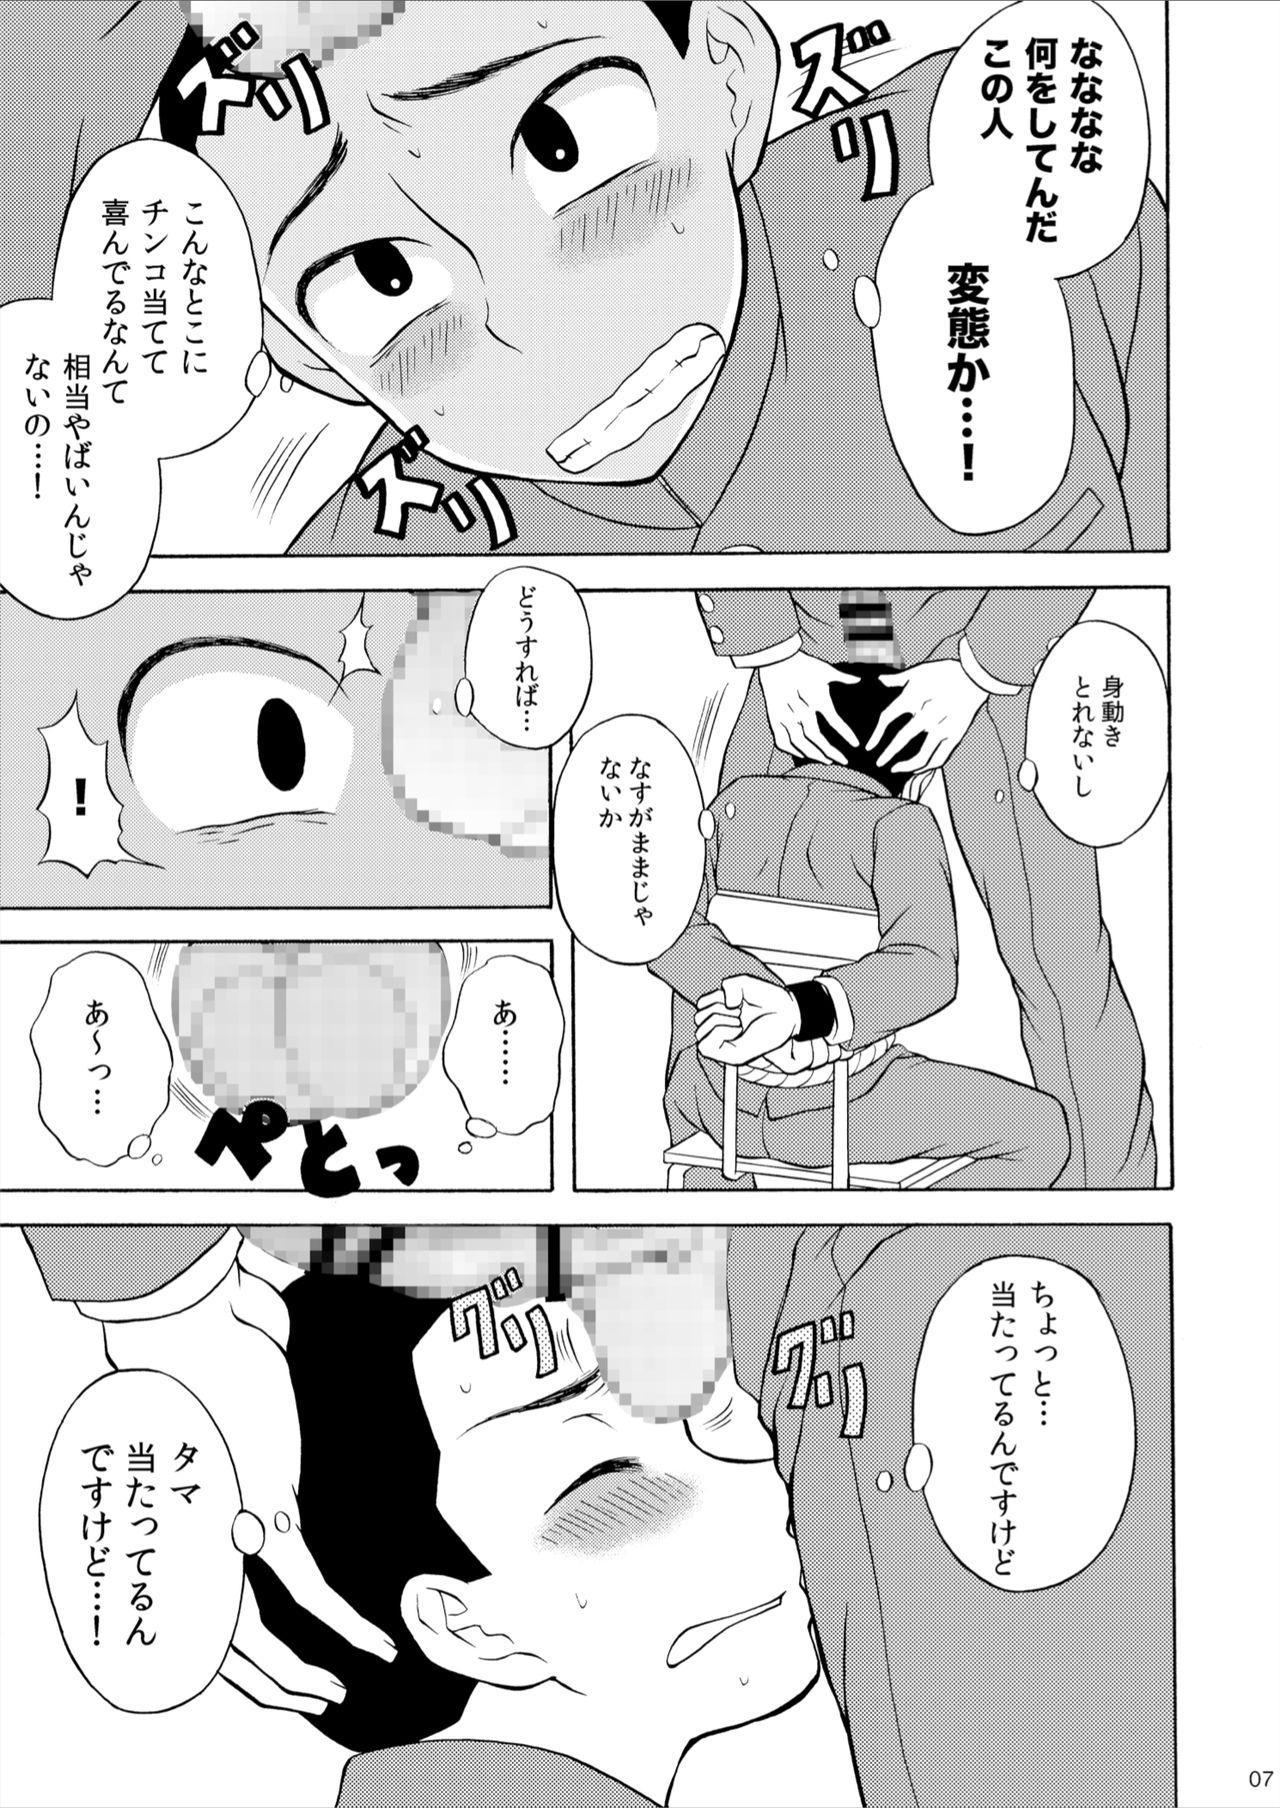 Marugari Jigokuhen 6